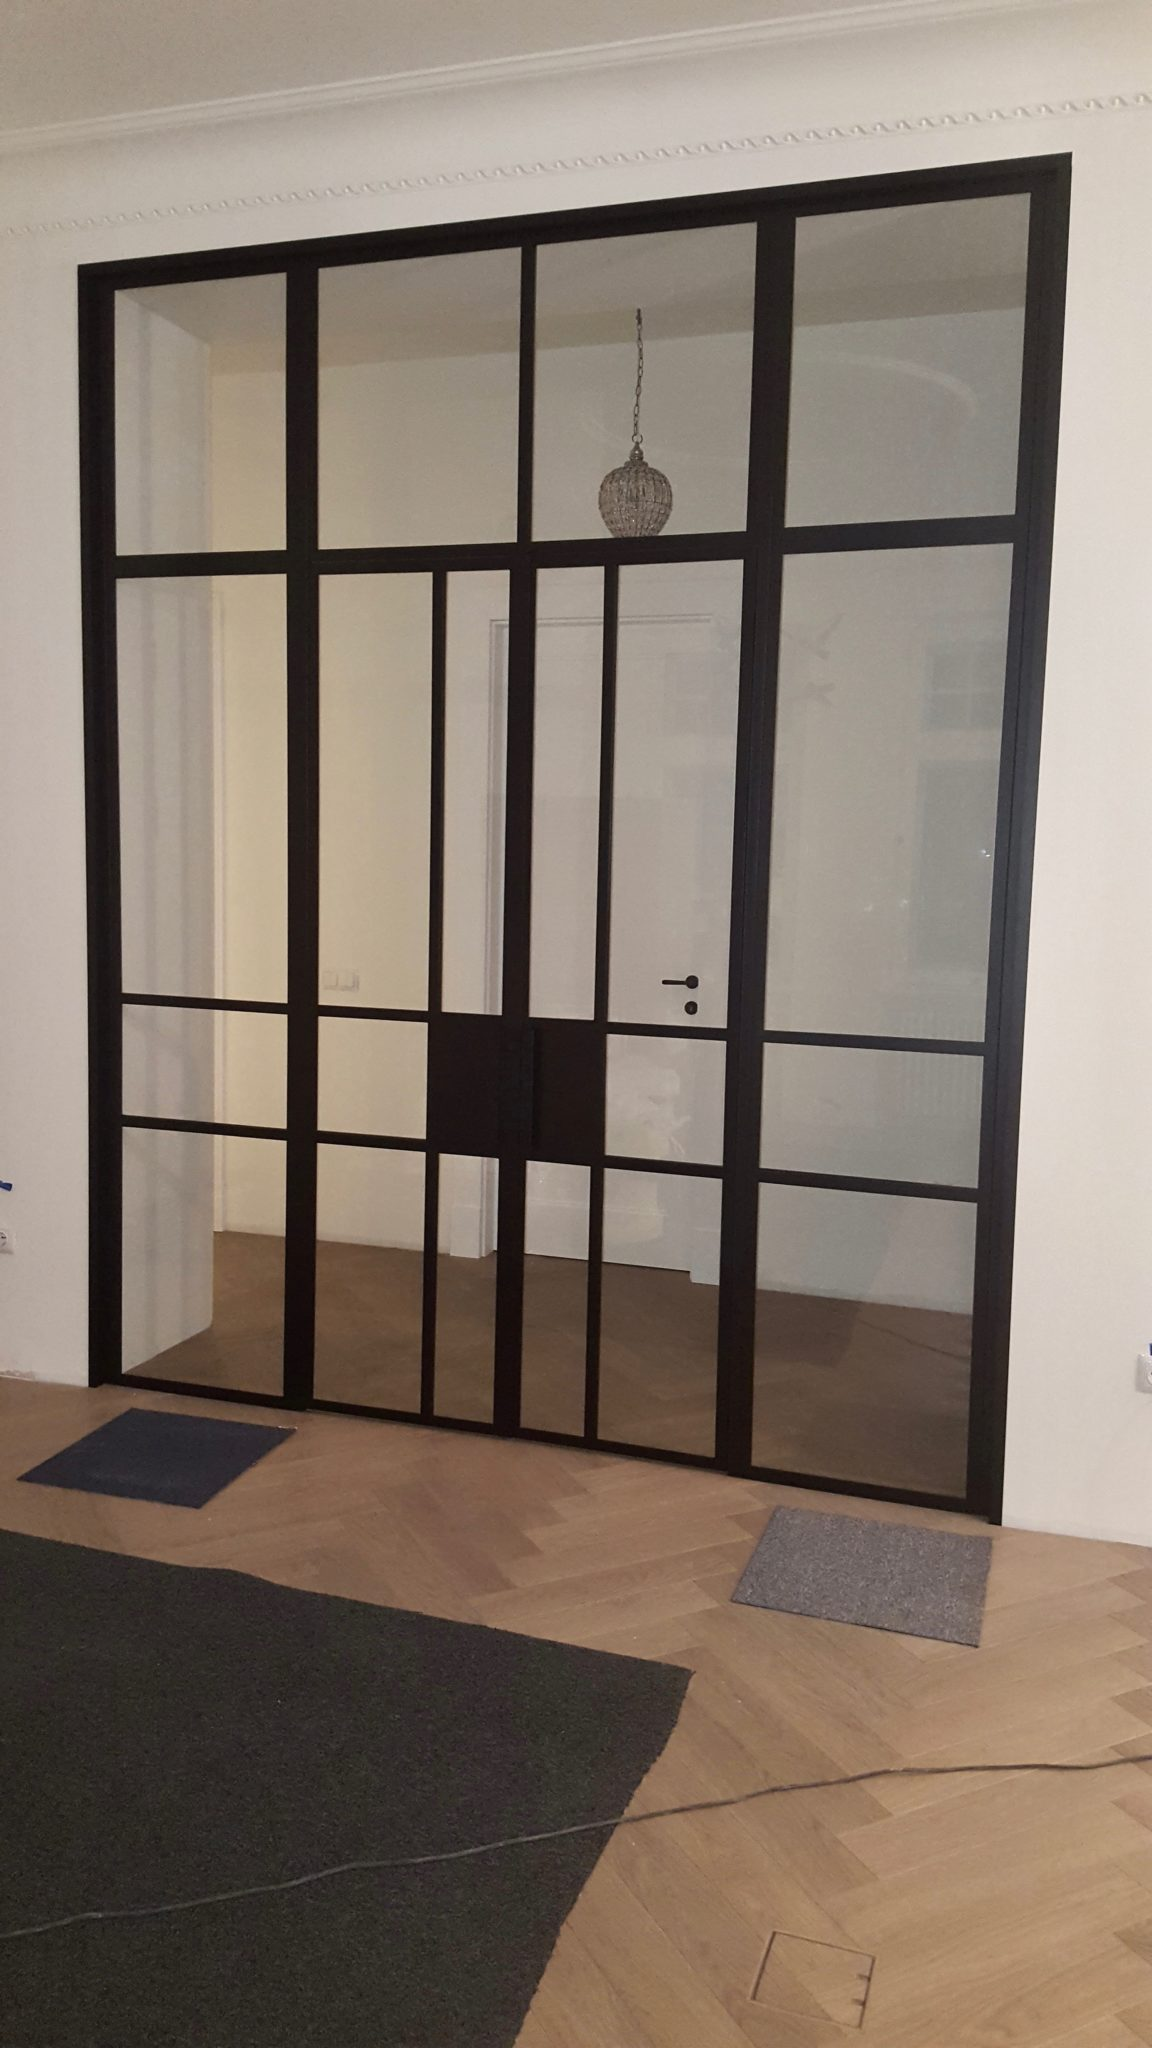 drzwi stalowe uchylne, drzwi loftowe, icon loft lite, drzwi szklane, drzwi metalowe, stalen deuren, setel door, loft door, drzwi kute, metaloplastyka,